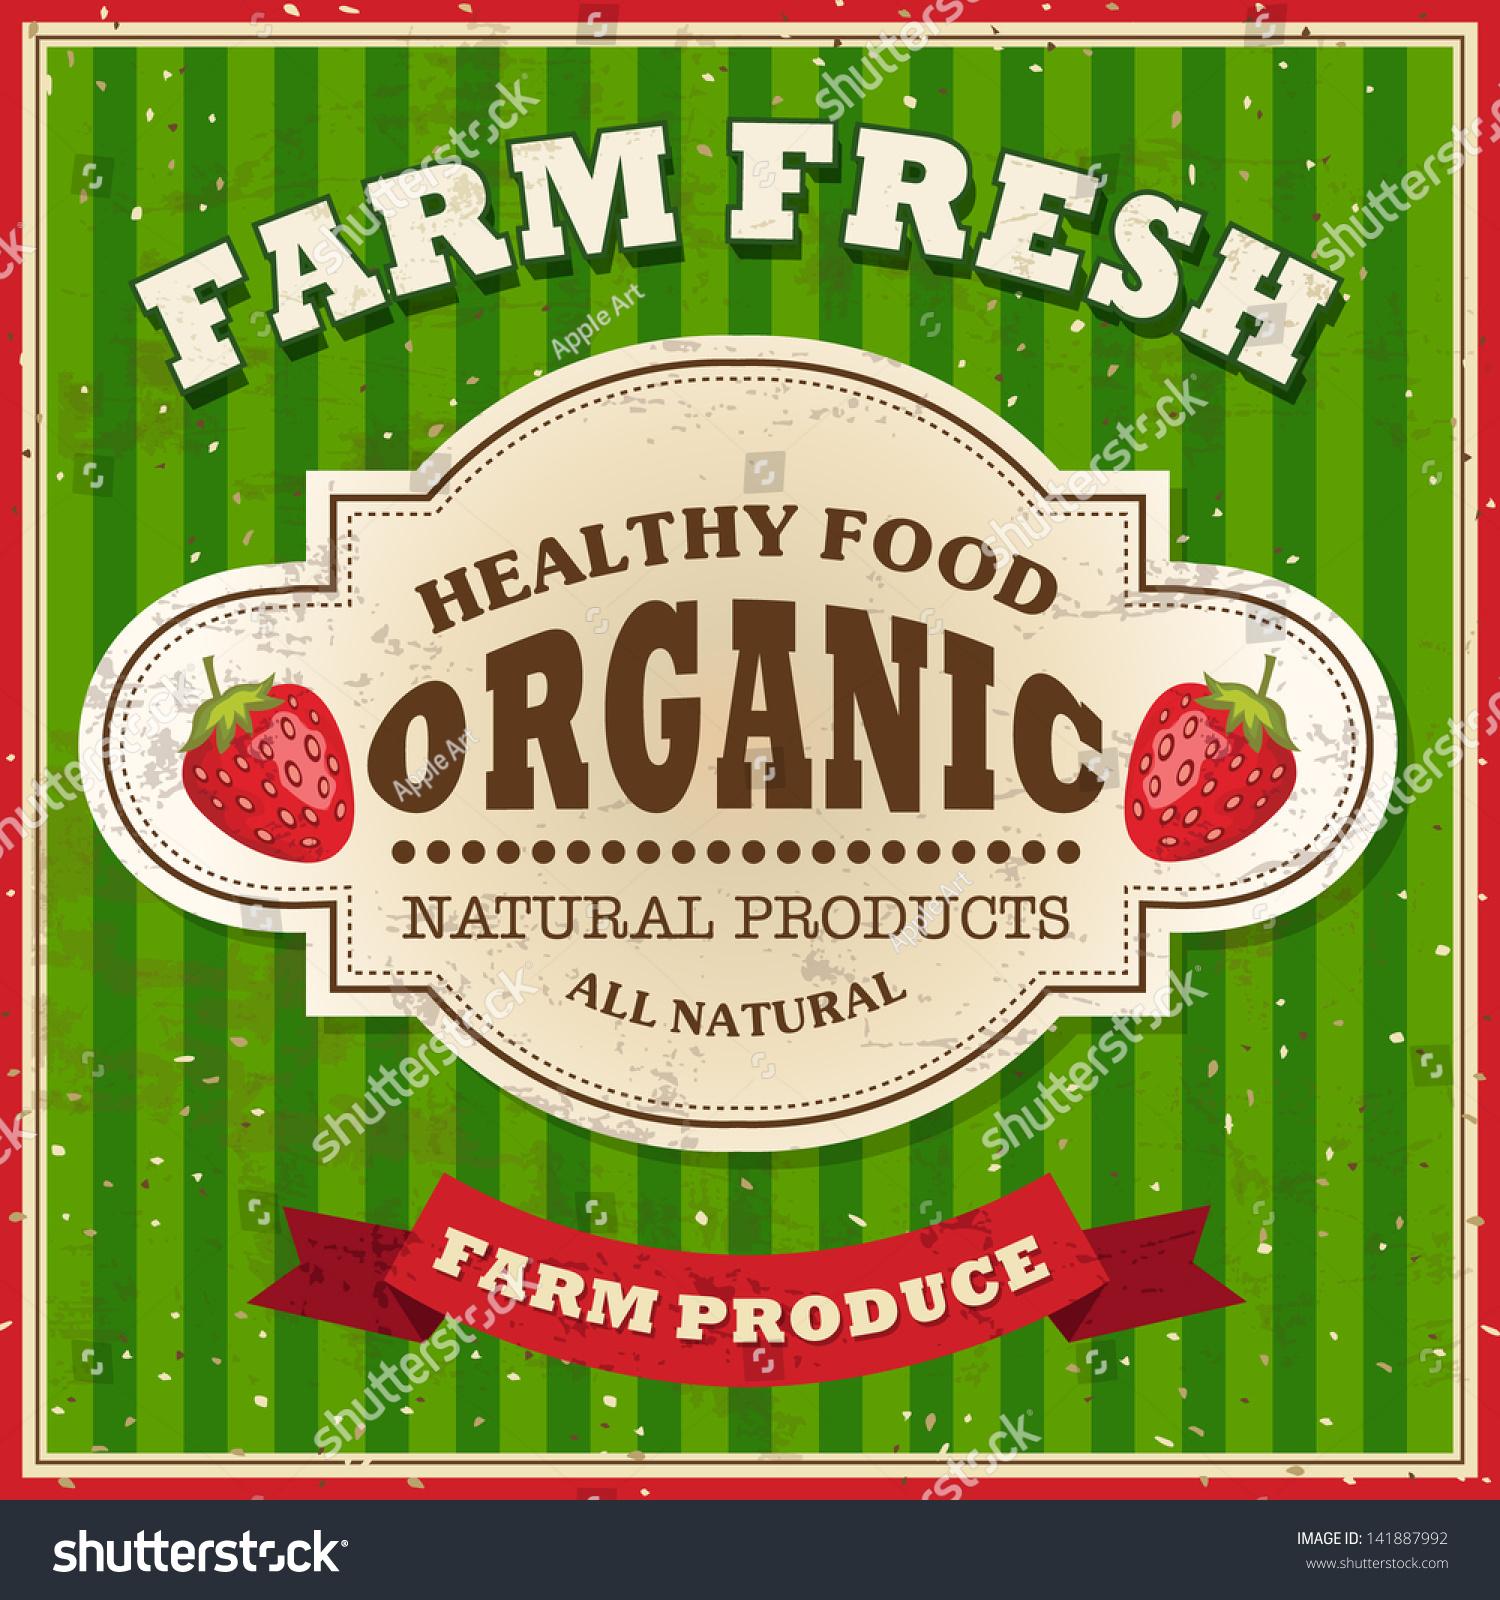 Retro - health farm